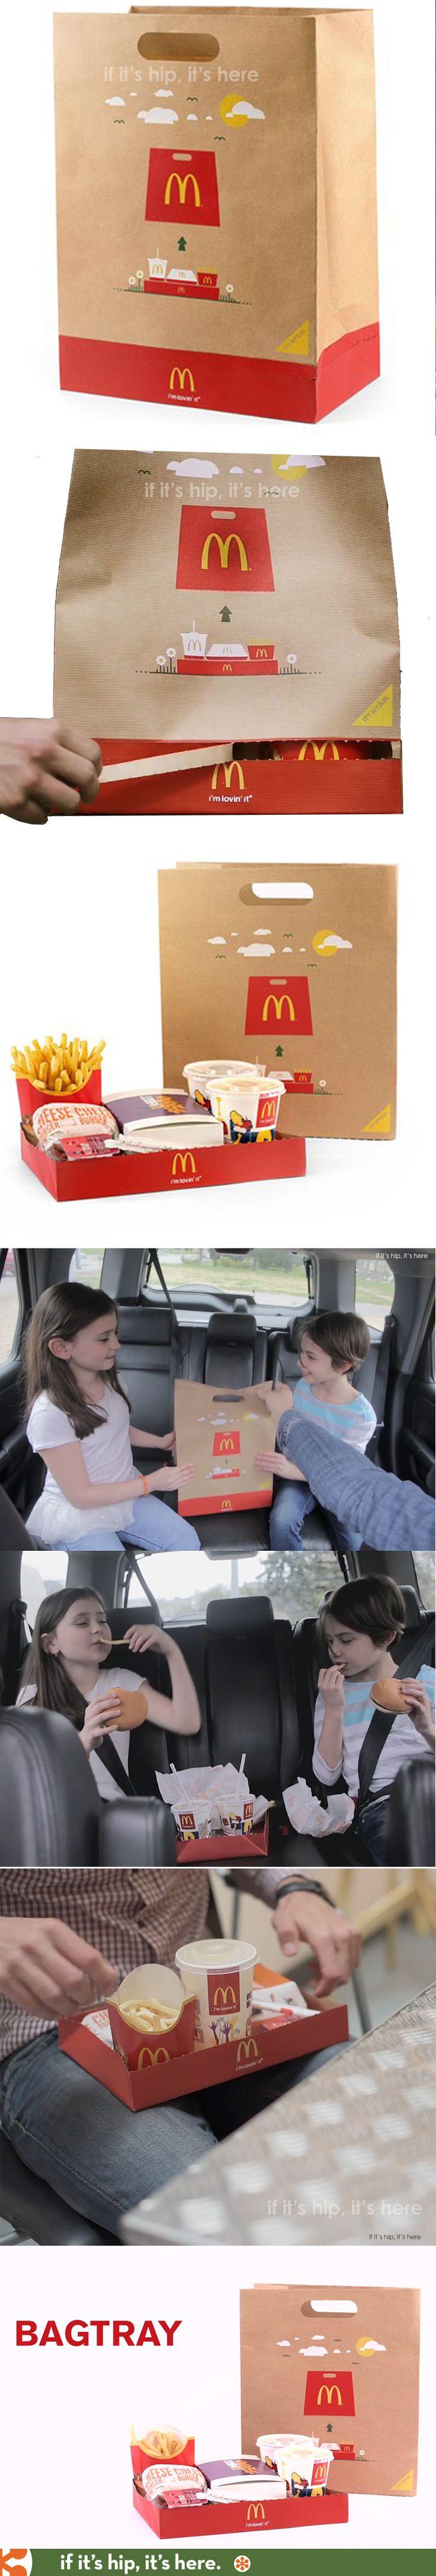 The Ingenious BagTray for McDonald's.